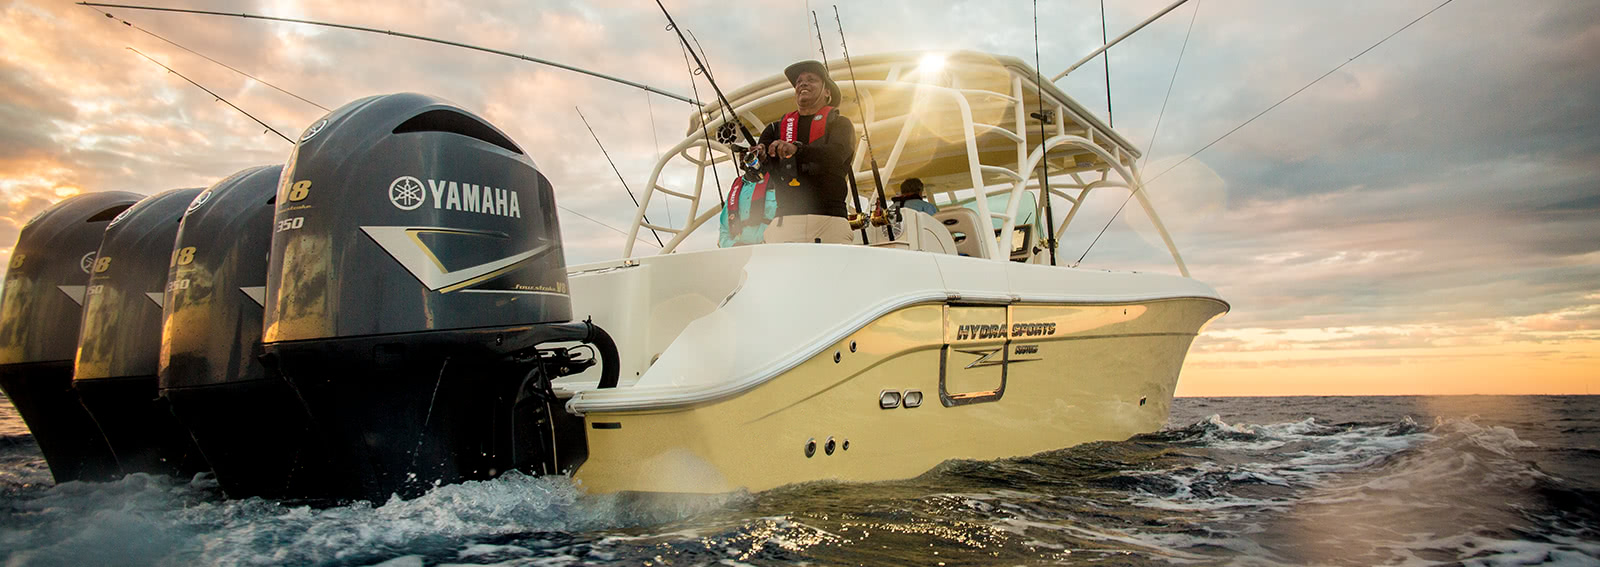 Angler using Yamaha Motors